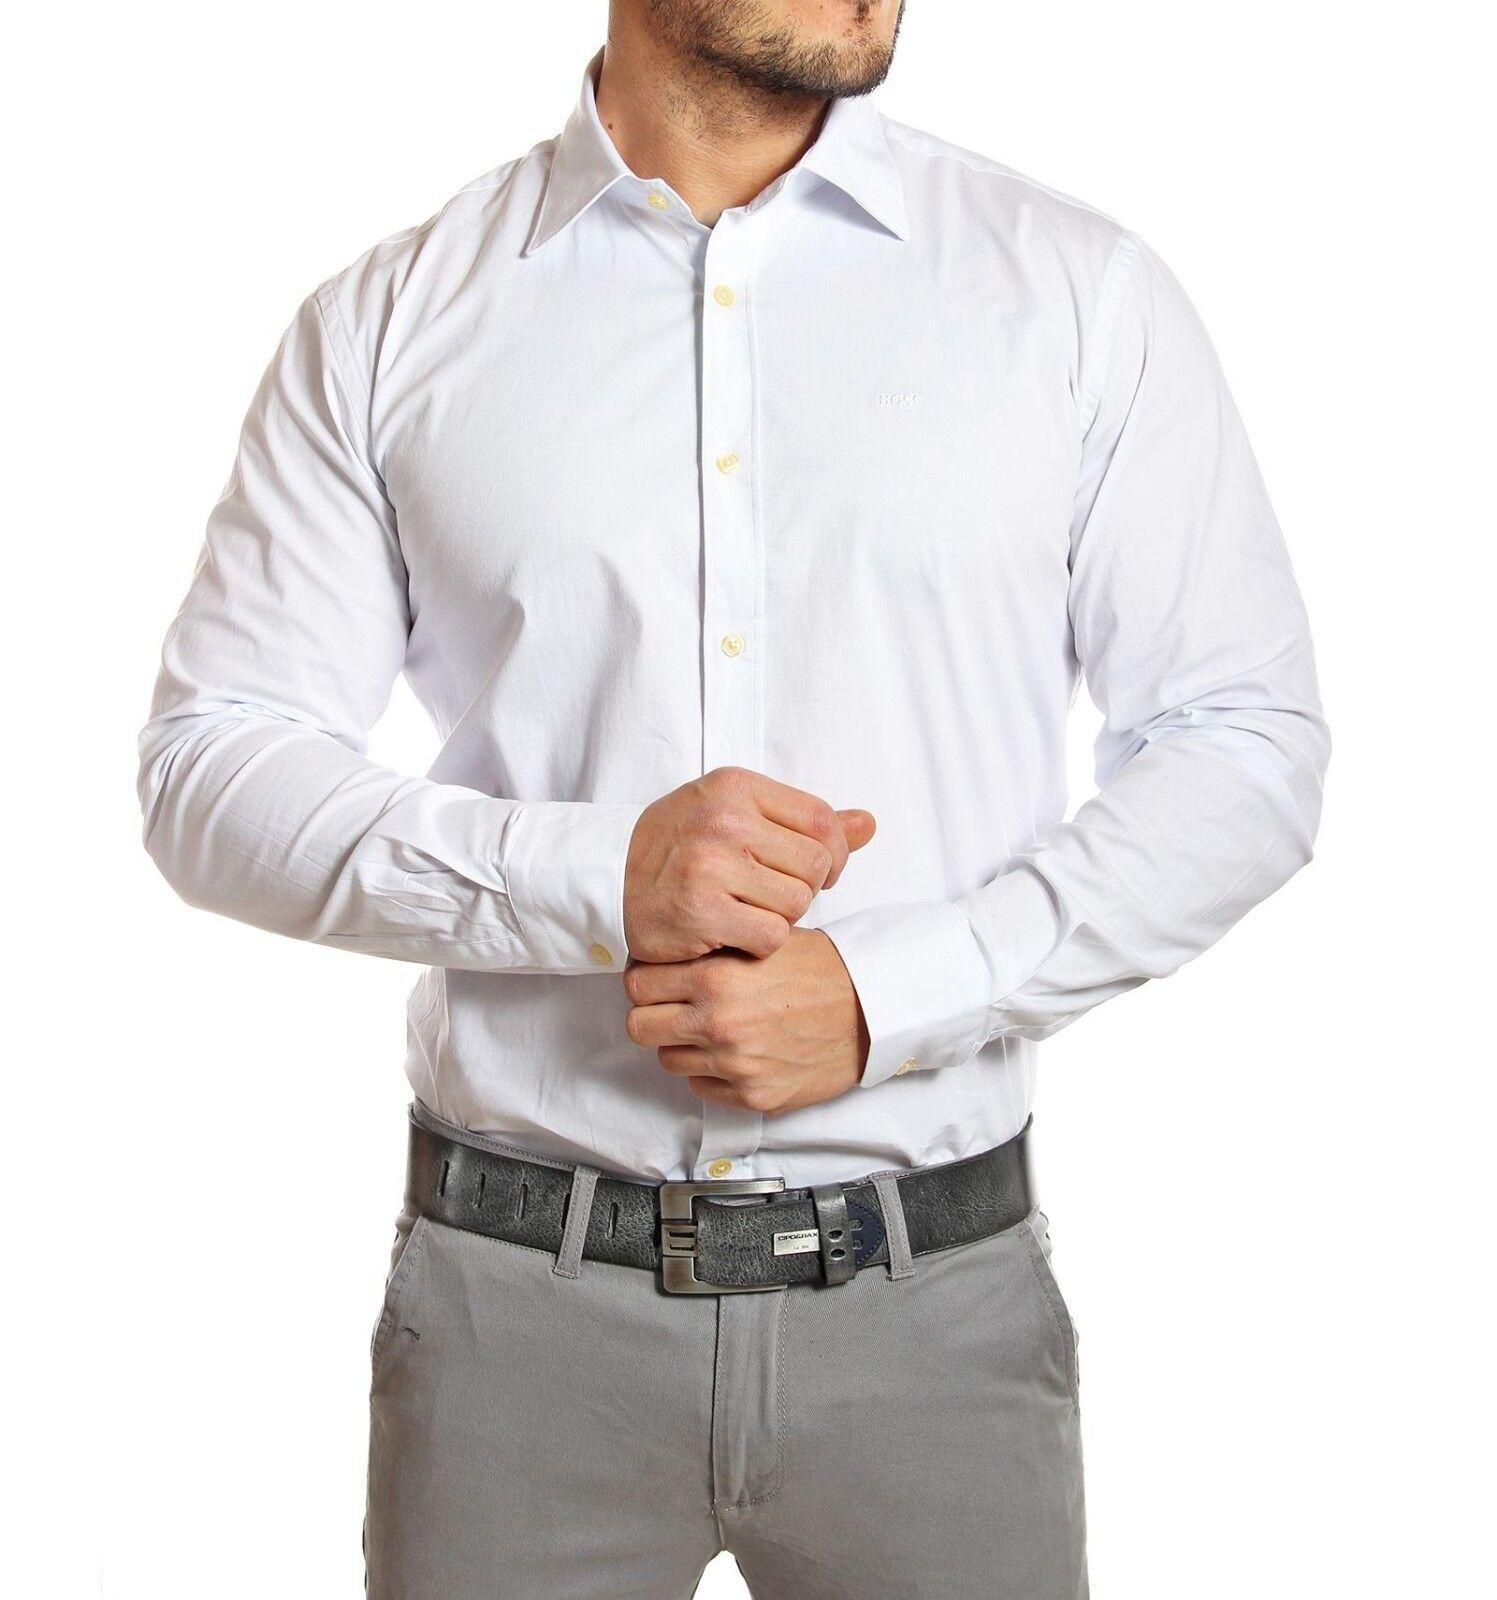 White (Dress Shirt)